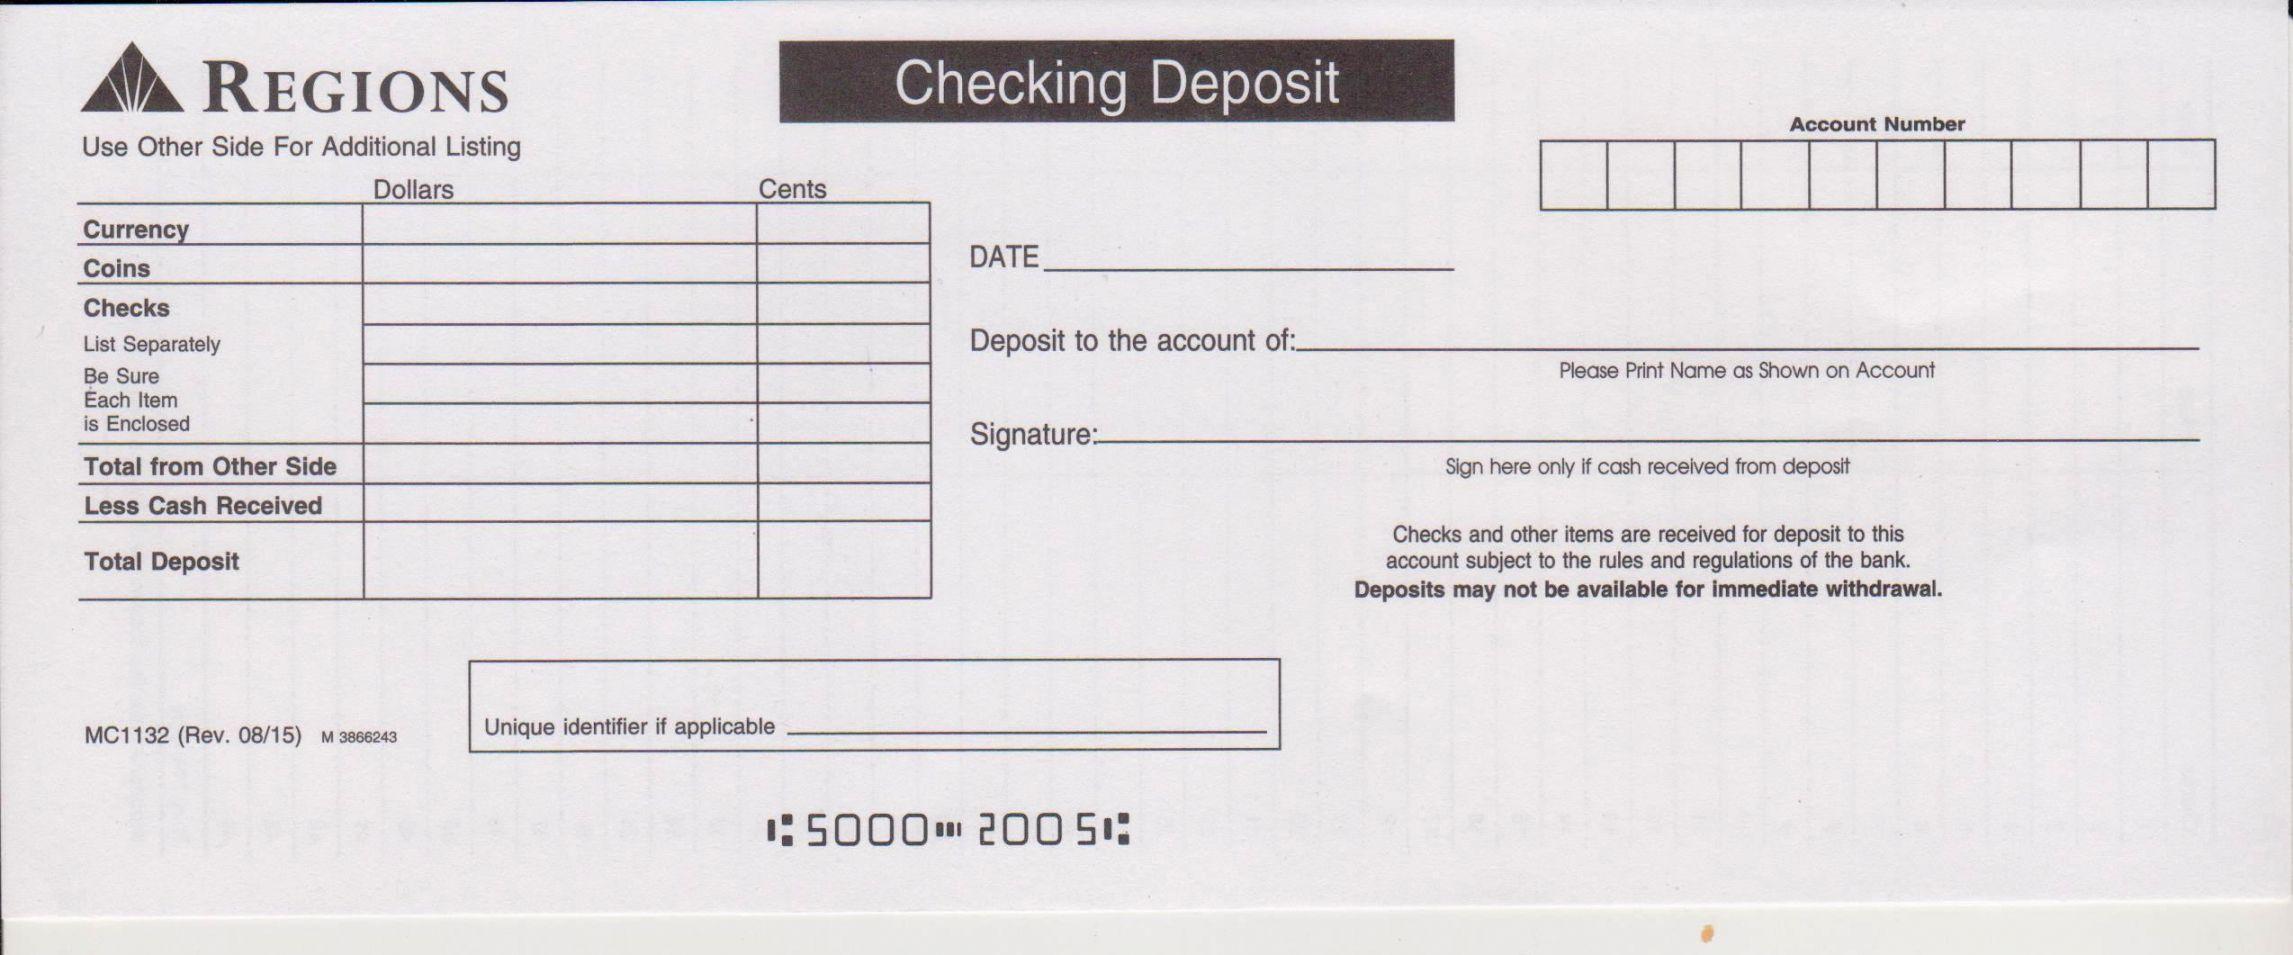 Get Our Example Of Cash Deposit Slip Template Deposit Bank Deposit Certificate Of Deposit